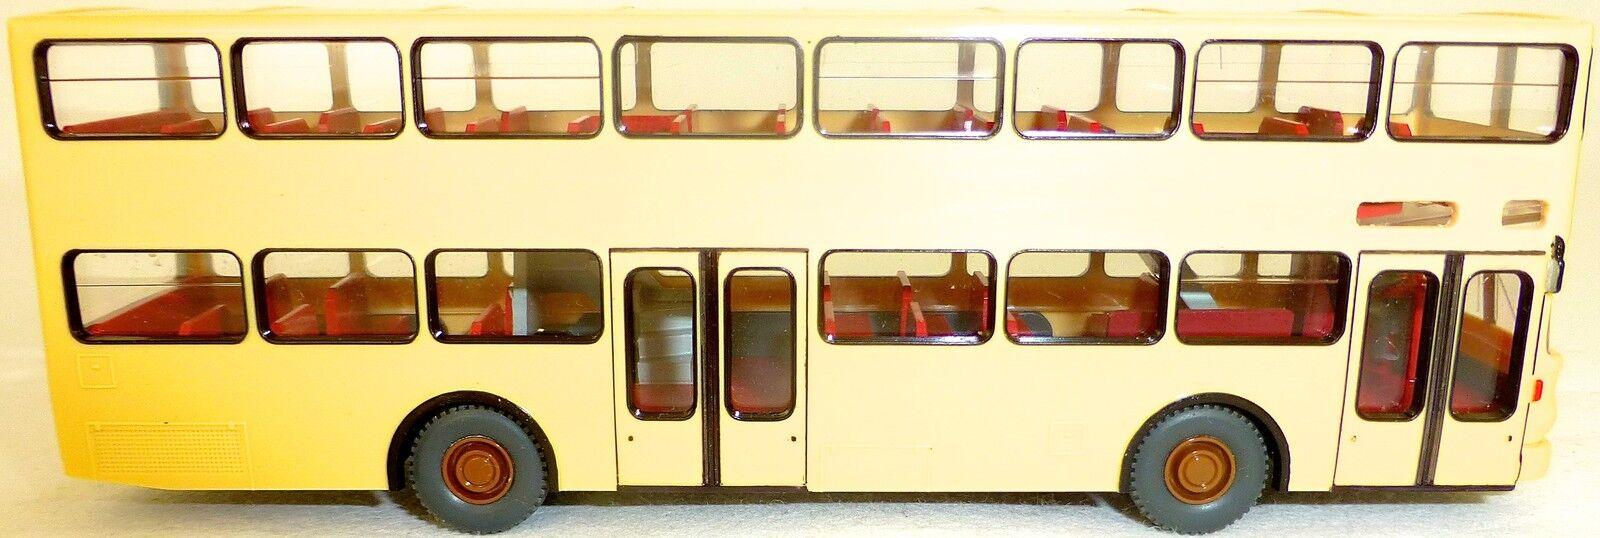 venta con descuento Anax BVG Biplano Man SD 200 Hecho a Mano de de de Wiking Bus 1 87 H0 SCHB4 Å  venta al por mayor barato